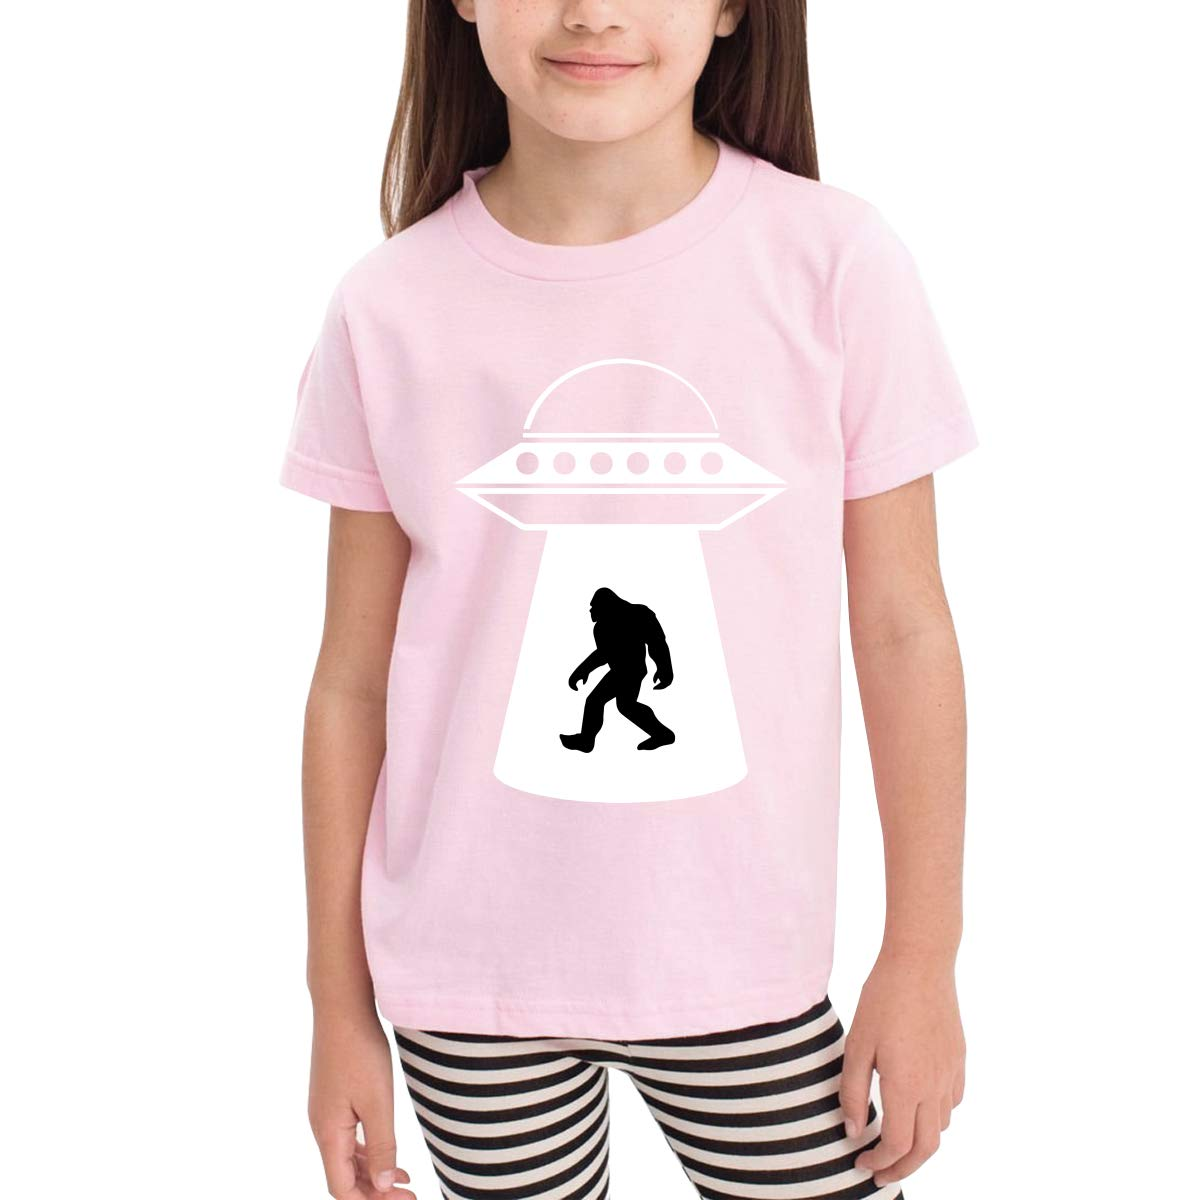 UFO Bigfoot Childrens Cotton Pink Short Sleeve T-Shirt for Girl